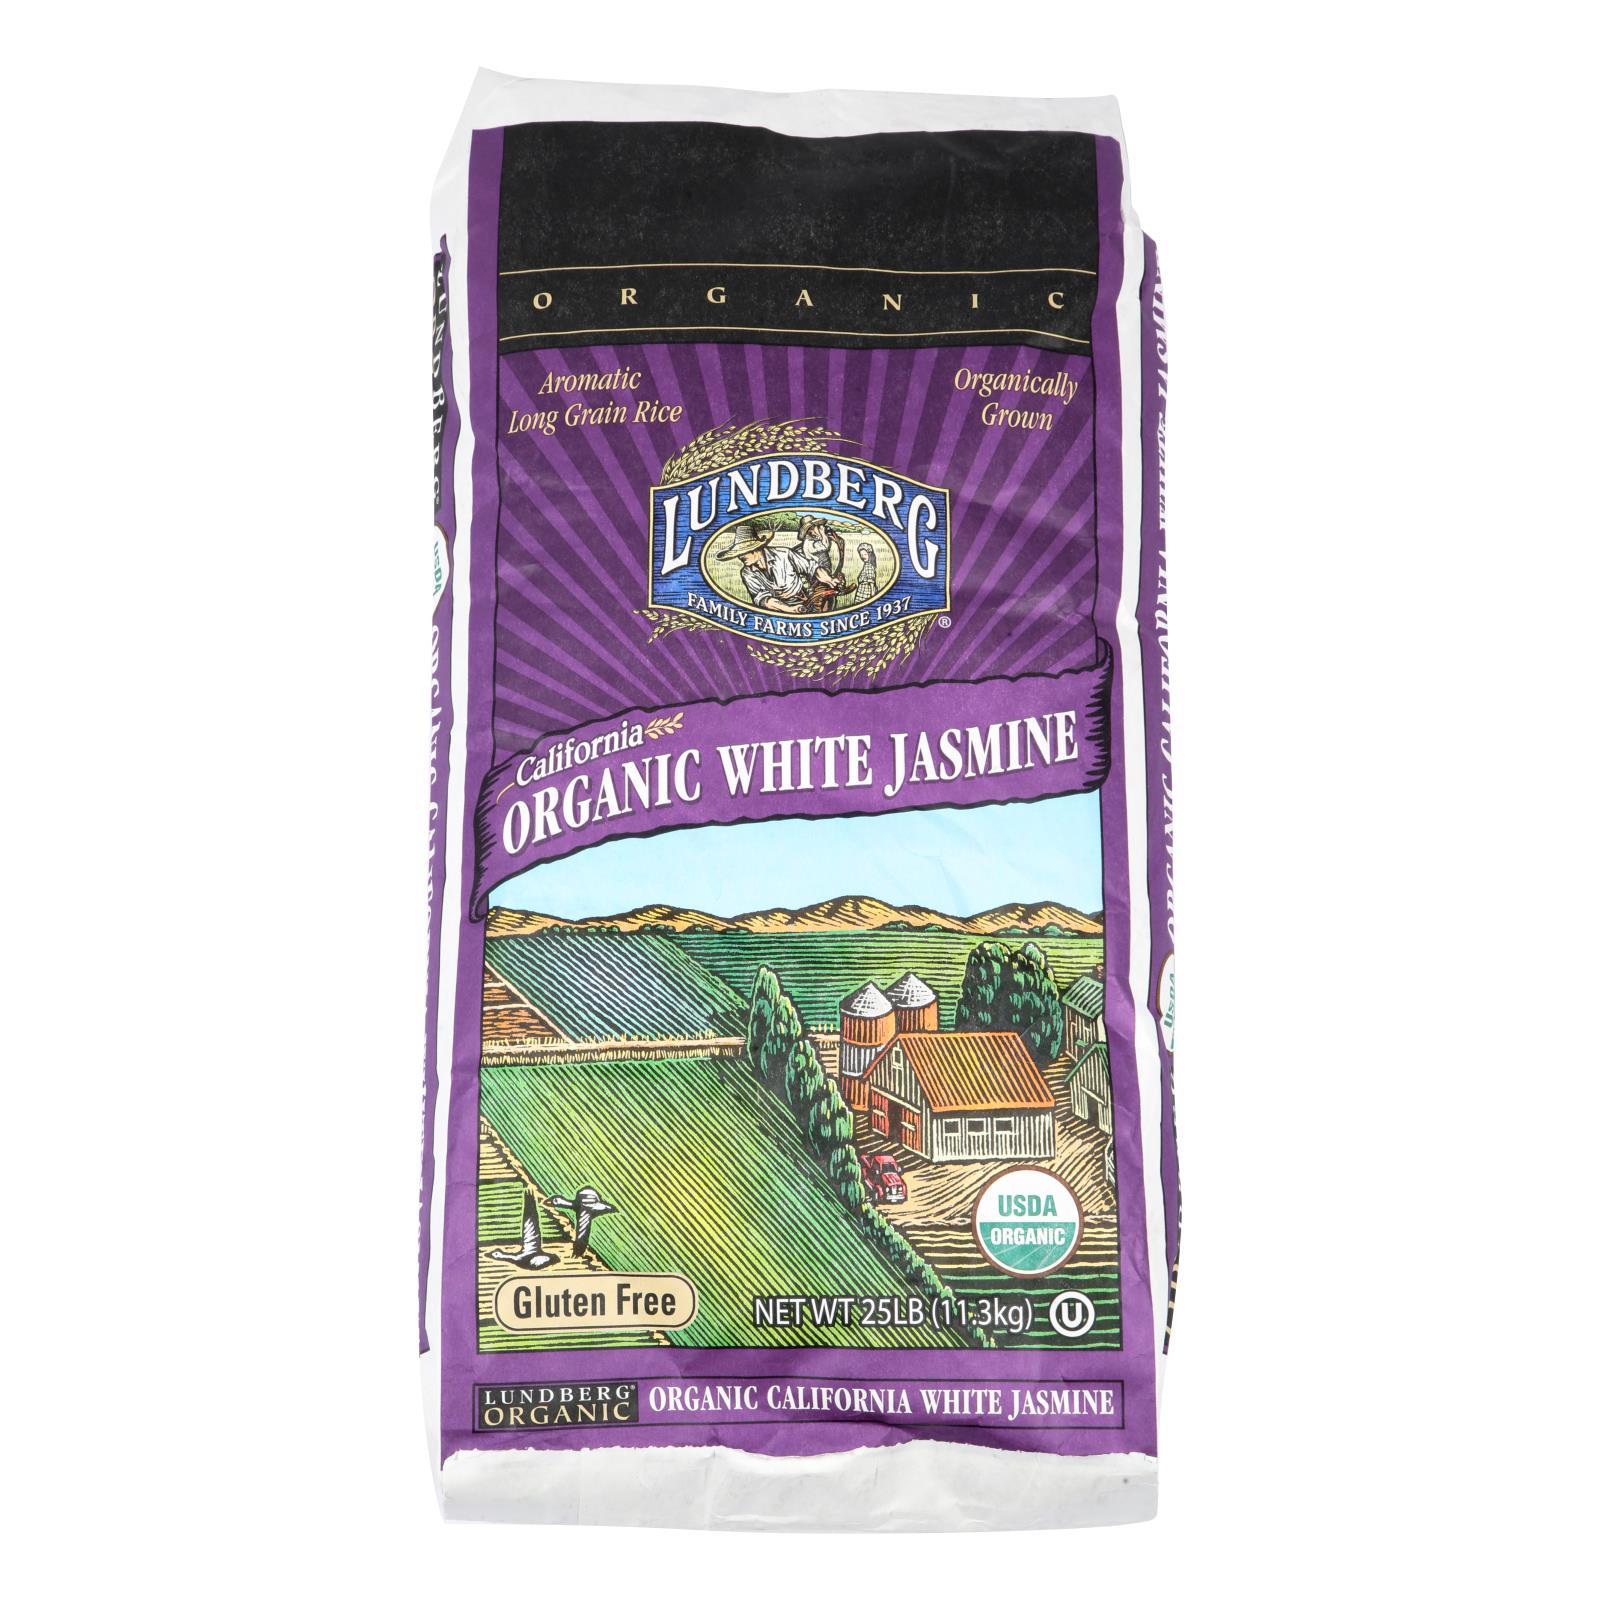 Lundberg Family Farms Organic Jasmine White Rice - Case of 25 lbs %count(alt)